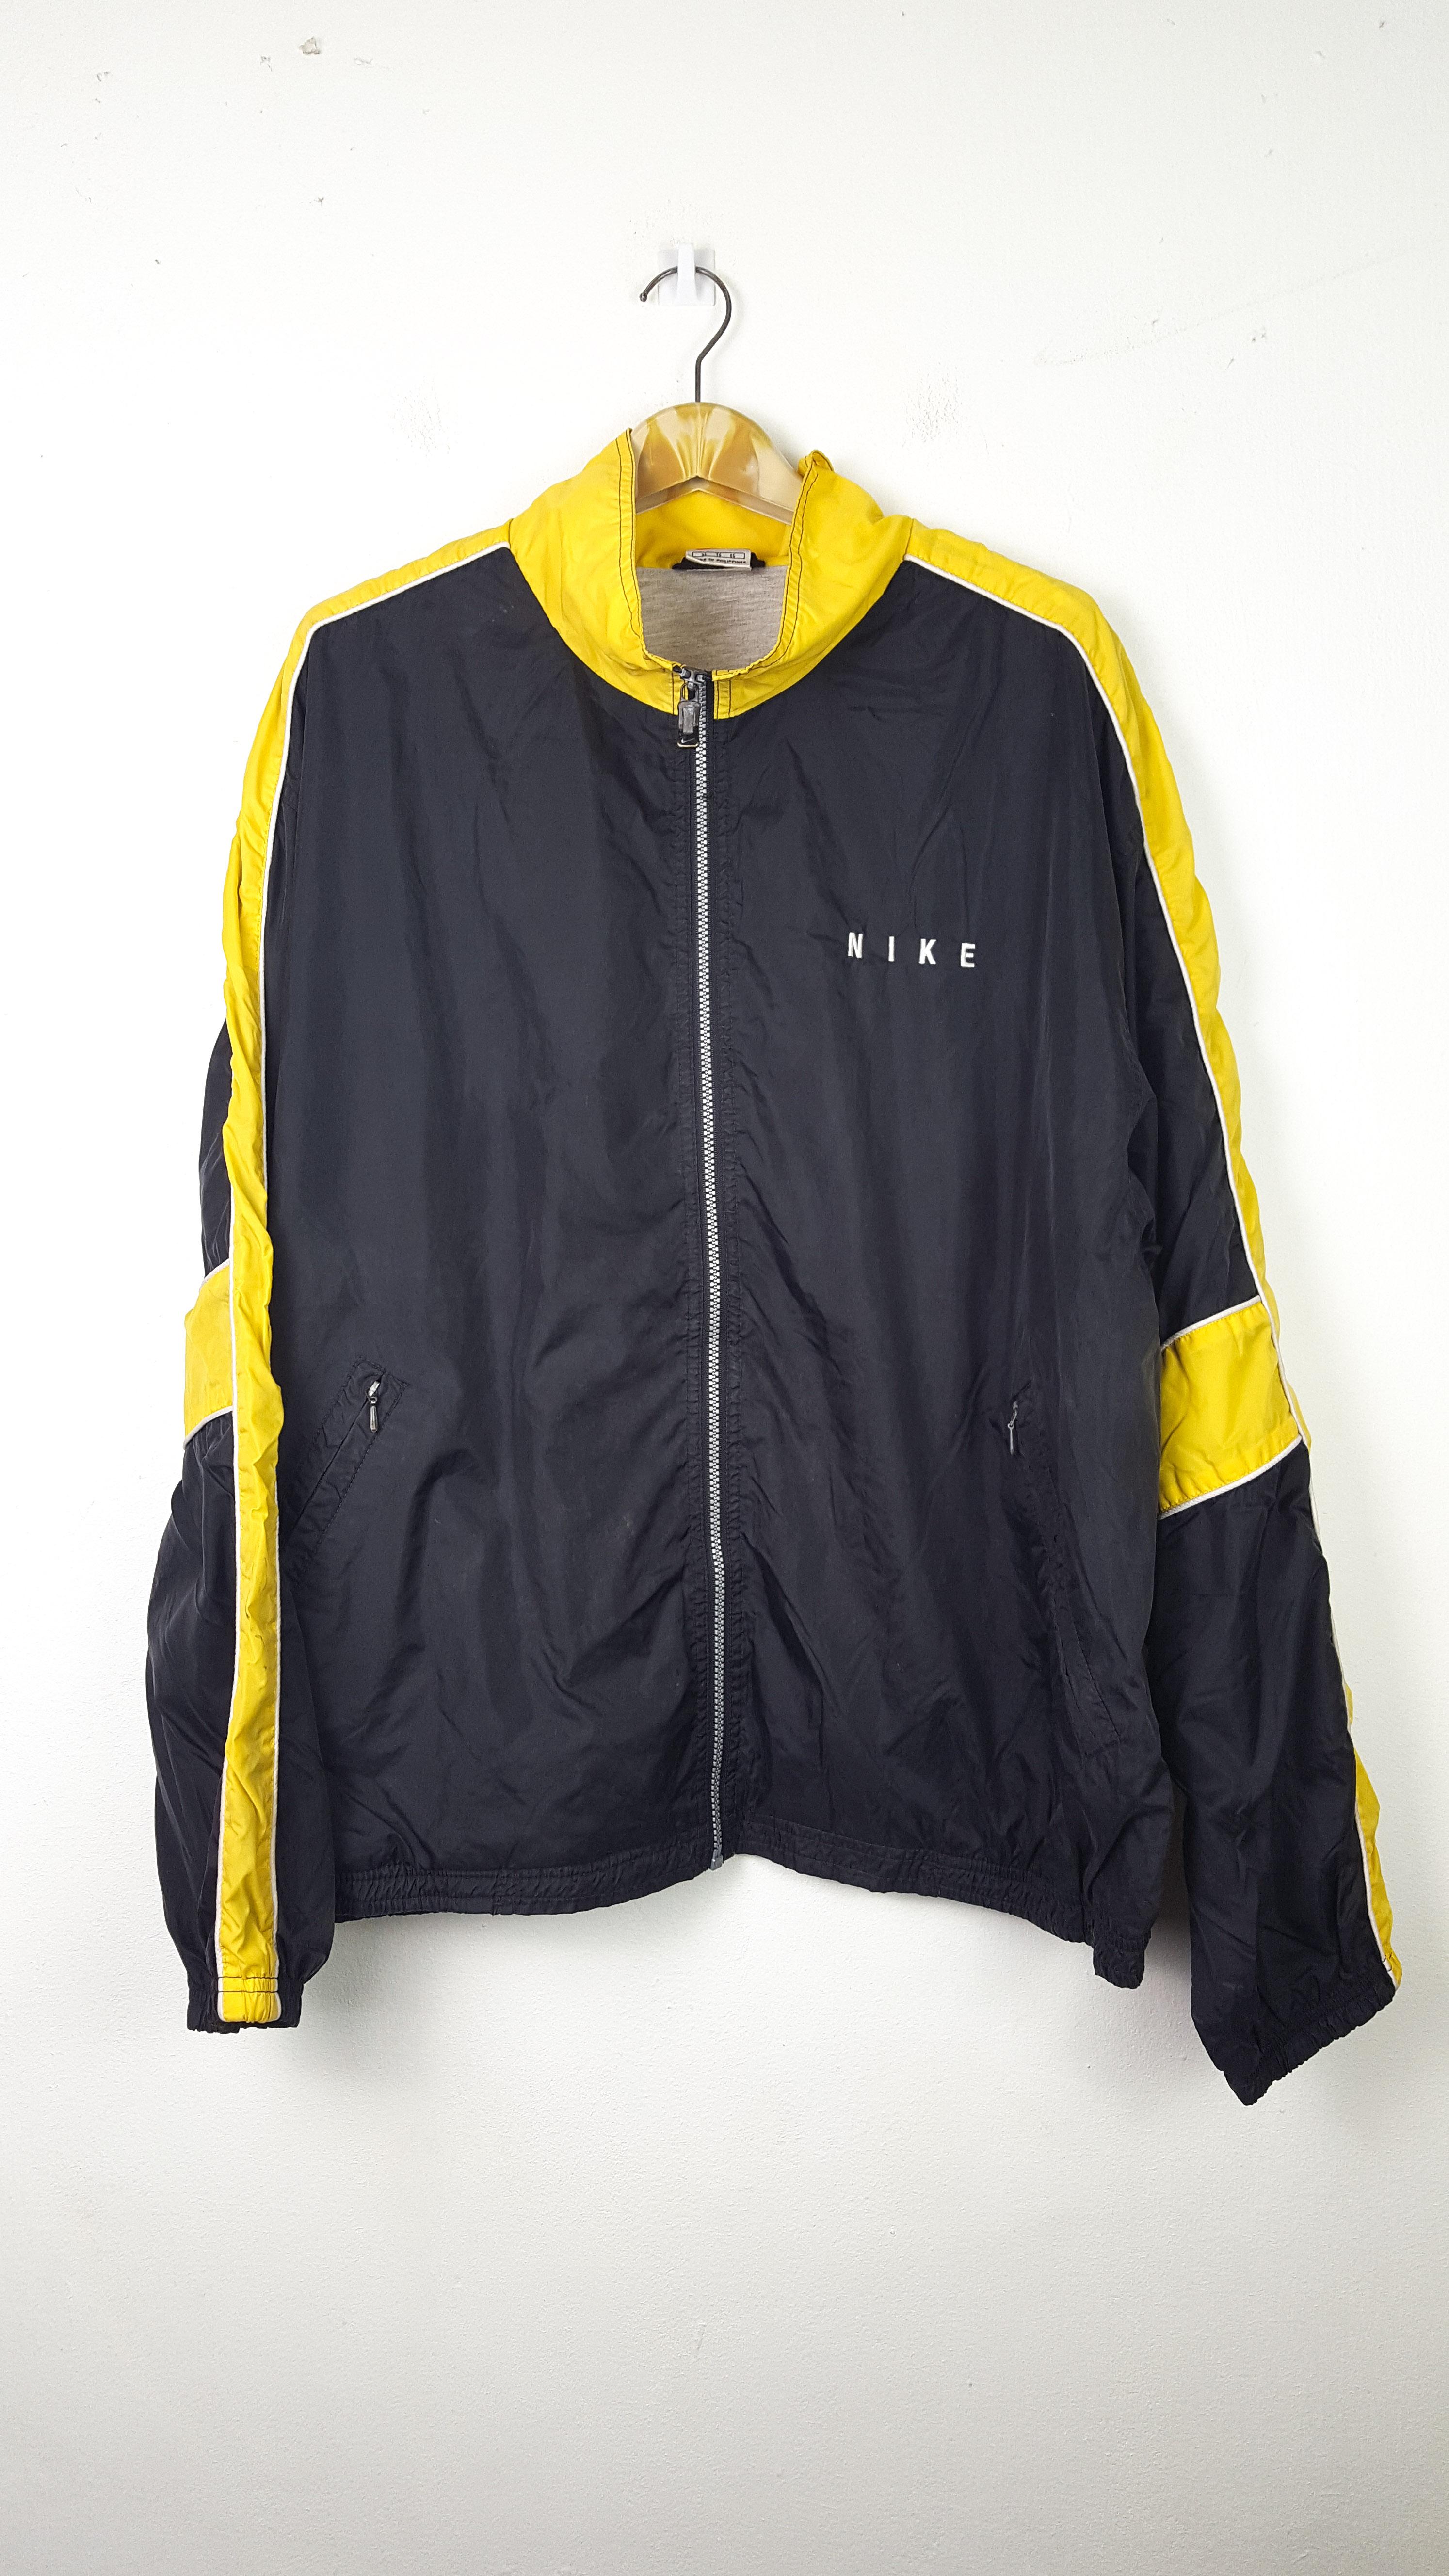 Nike × Vintage. Vintage Rare NIKE Swoosh Yellow Black Oversize Windbreaker  Jacket 8f72fc6fd